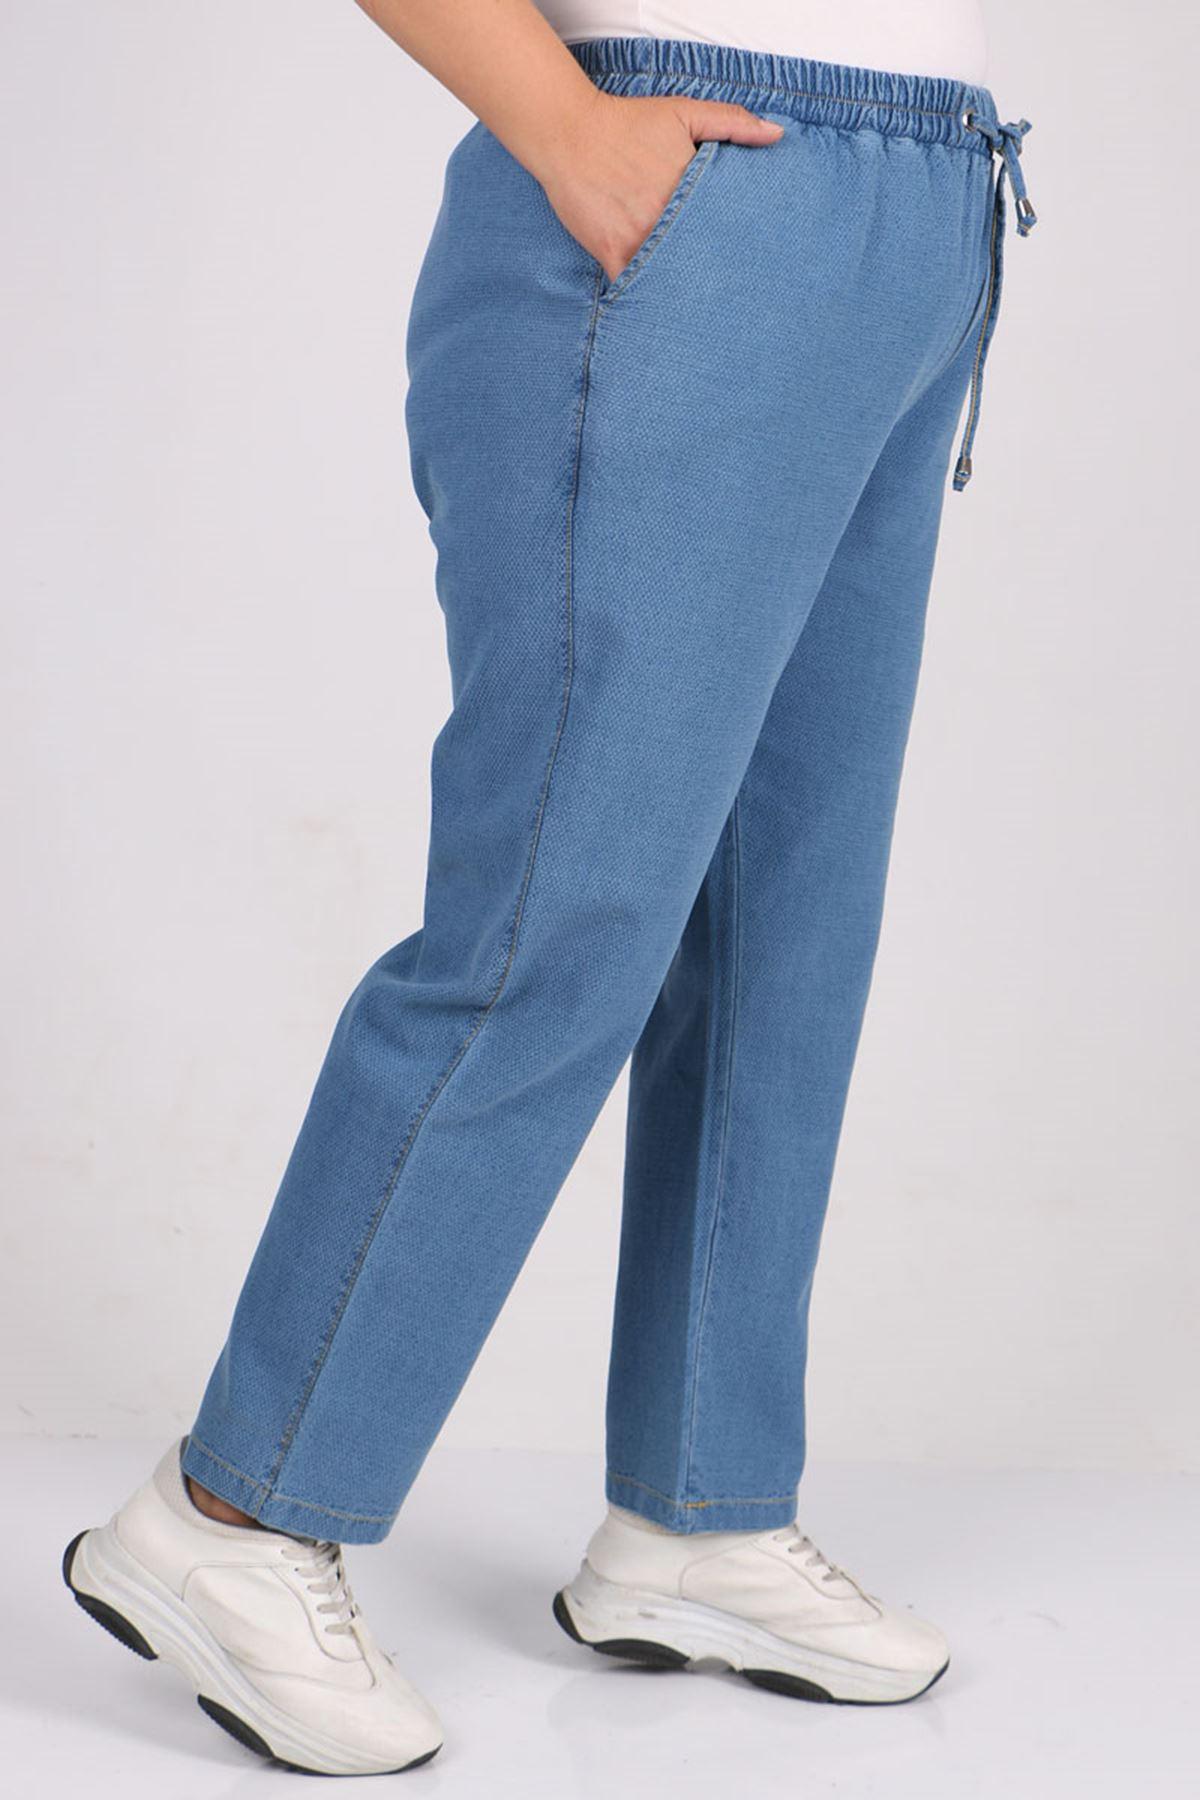 9154-1 Büyük Beden Dar Paça Kot Pantolon - Mavi